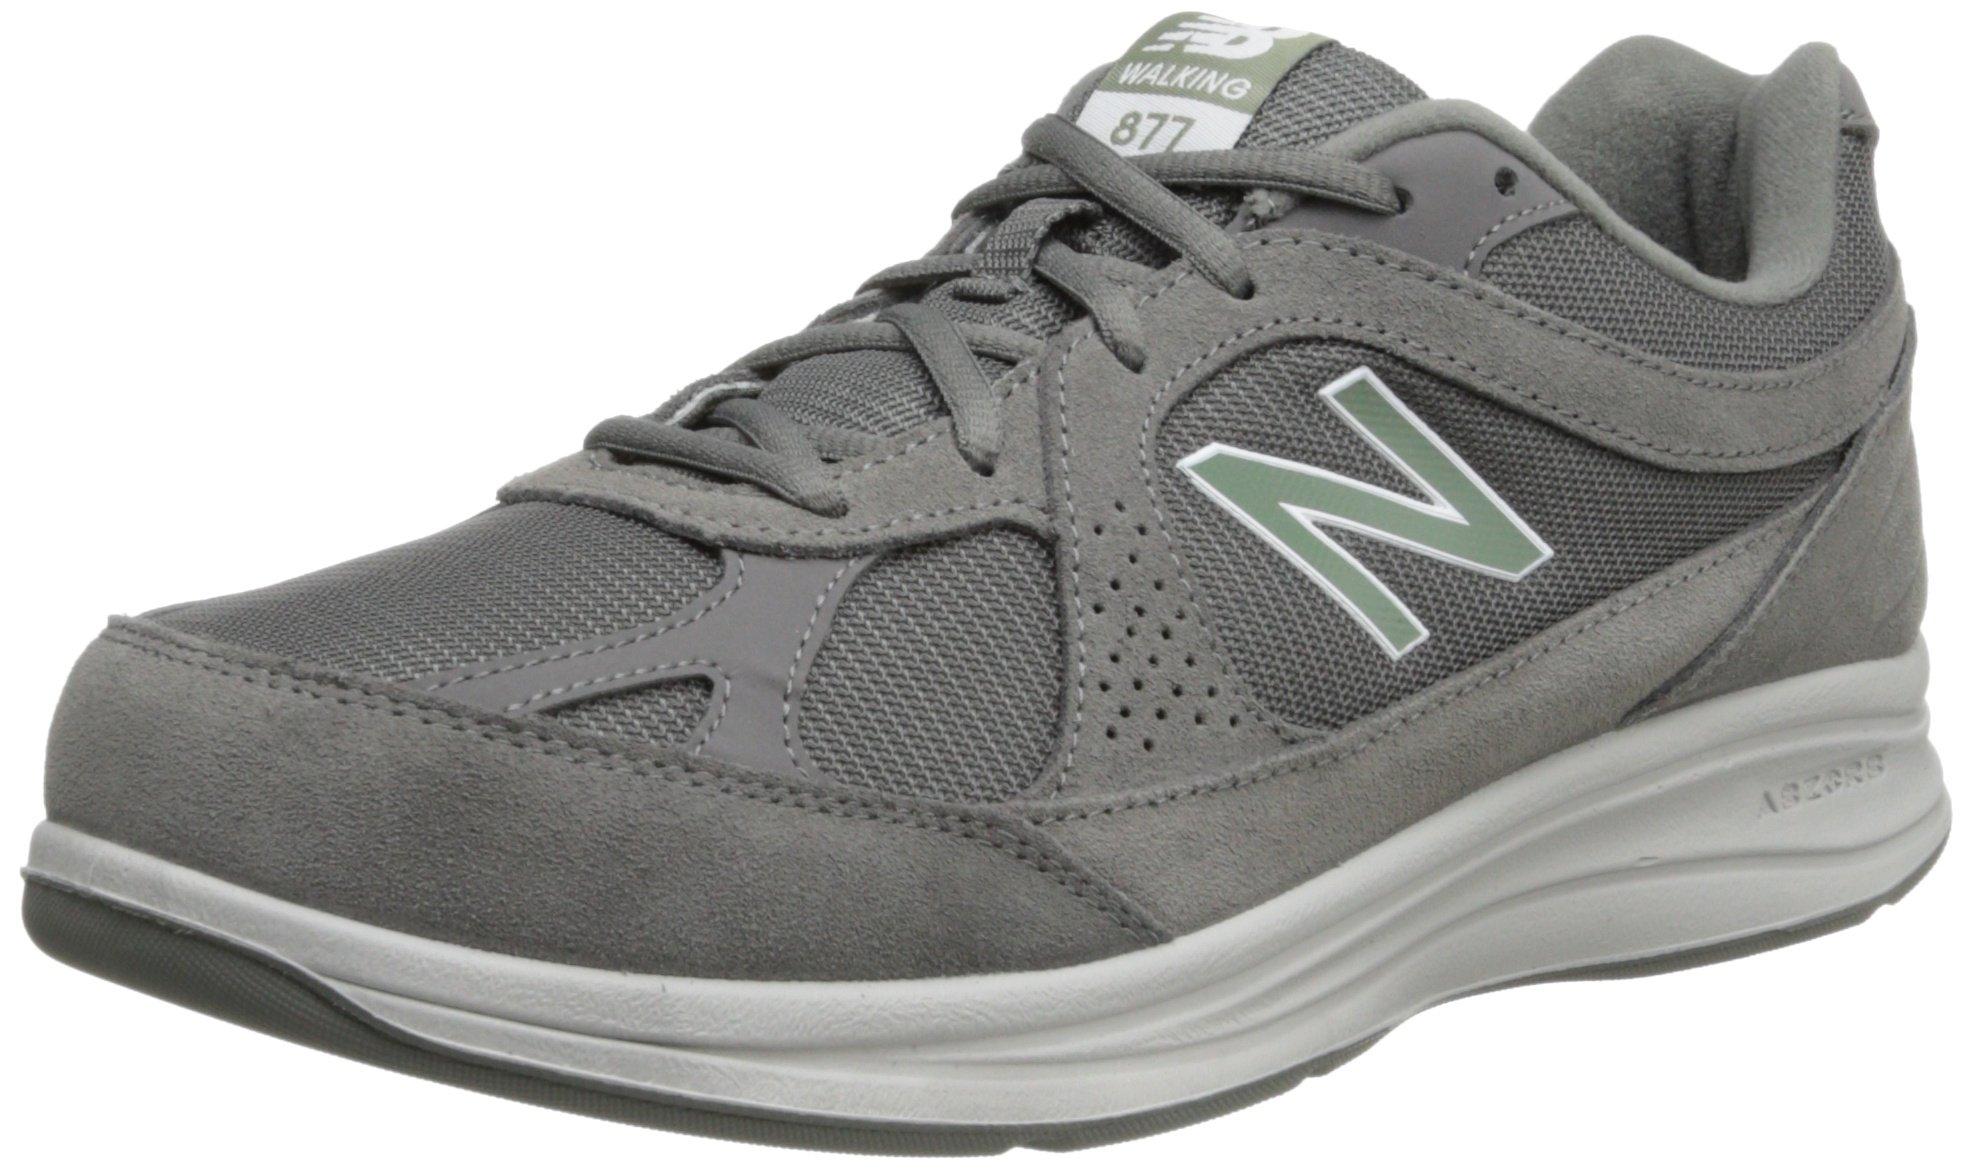 New Balance Mens MW877 Walking